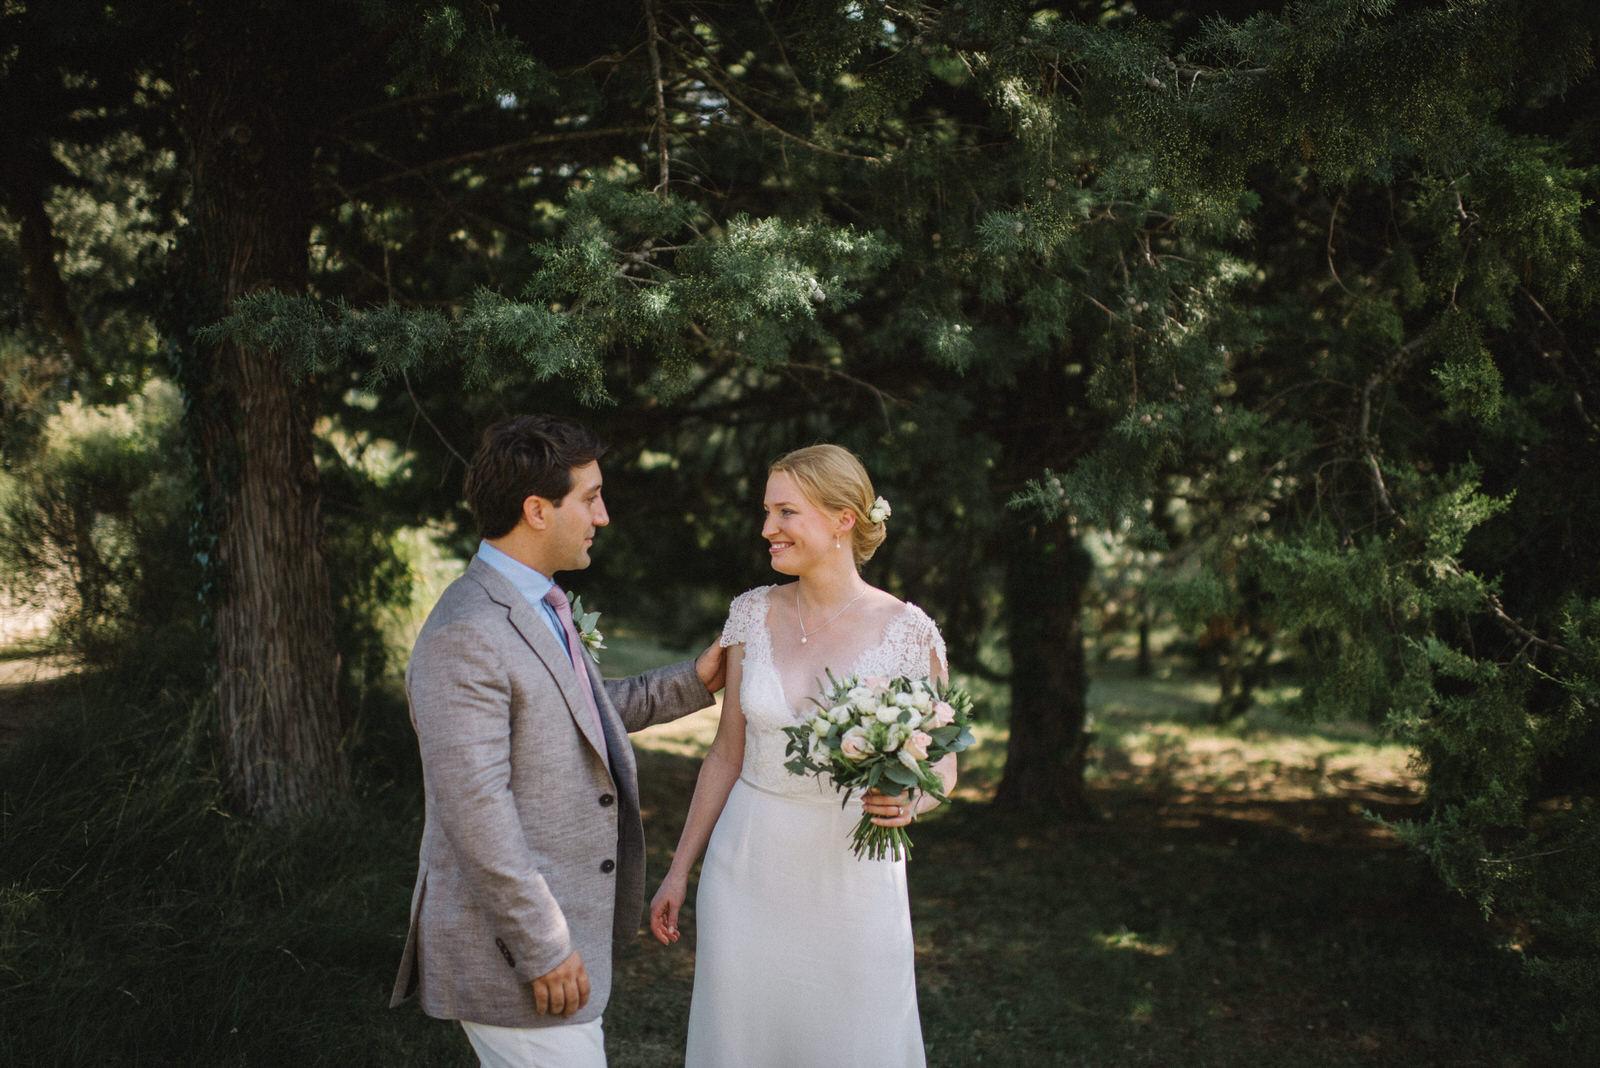 017-LOURMARIN-WEDDING-PHOTOGRAPHER-PROVENCE-WEDDING-ALTERNATIVE-WEDDING-PHOTOGRAPHY-FRANCE-PROVENCE-GARDEN-WEDDING.JPG